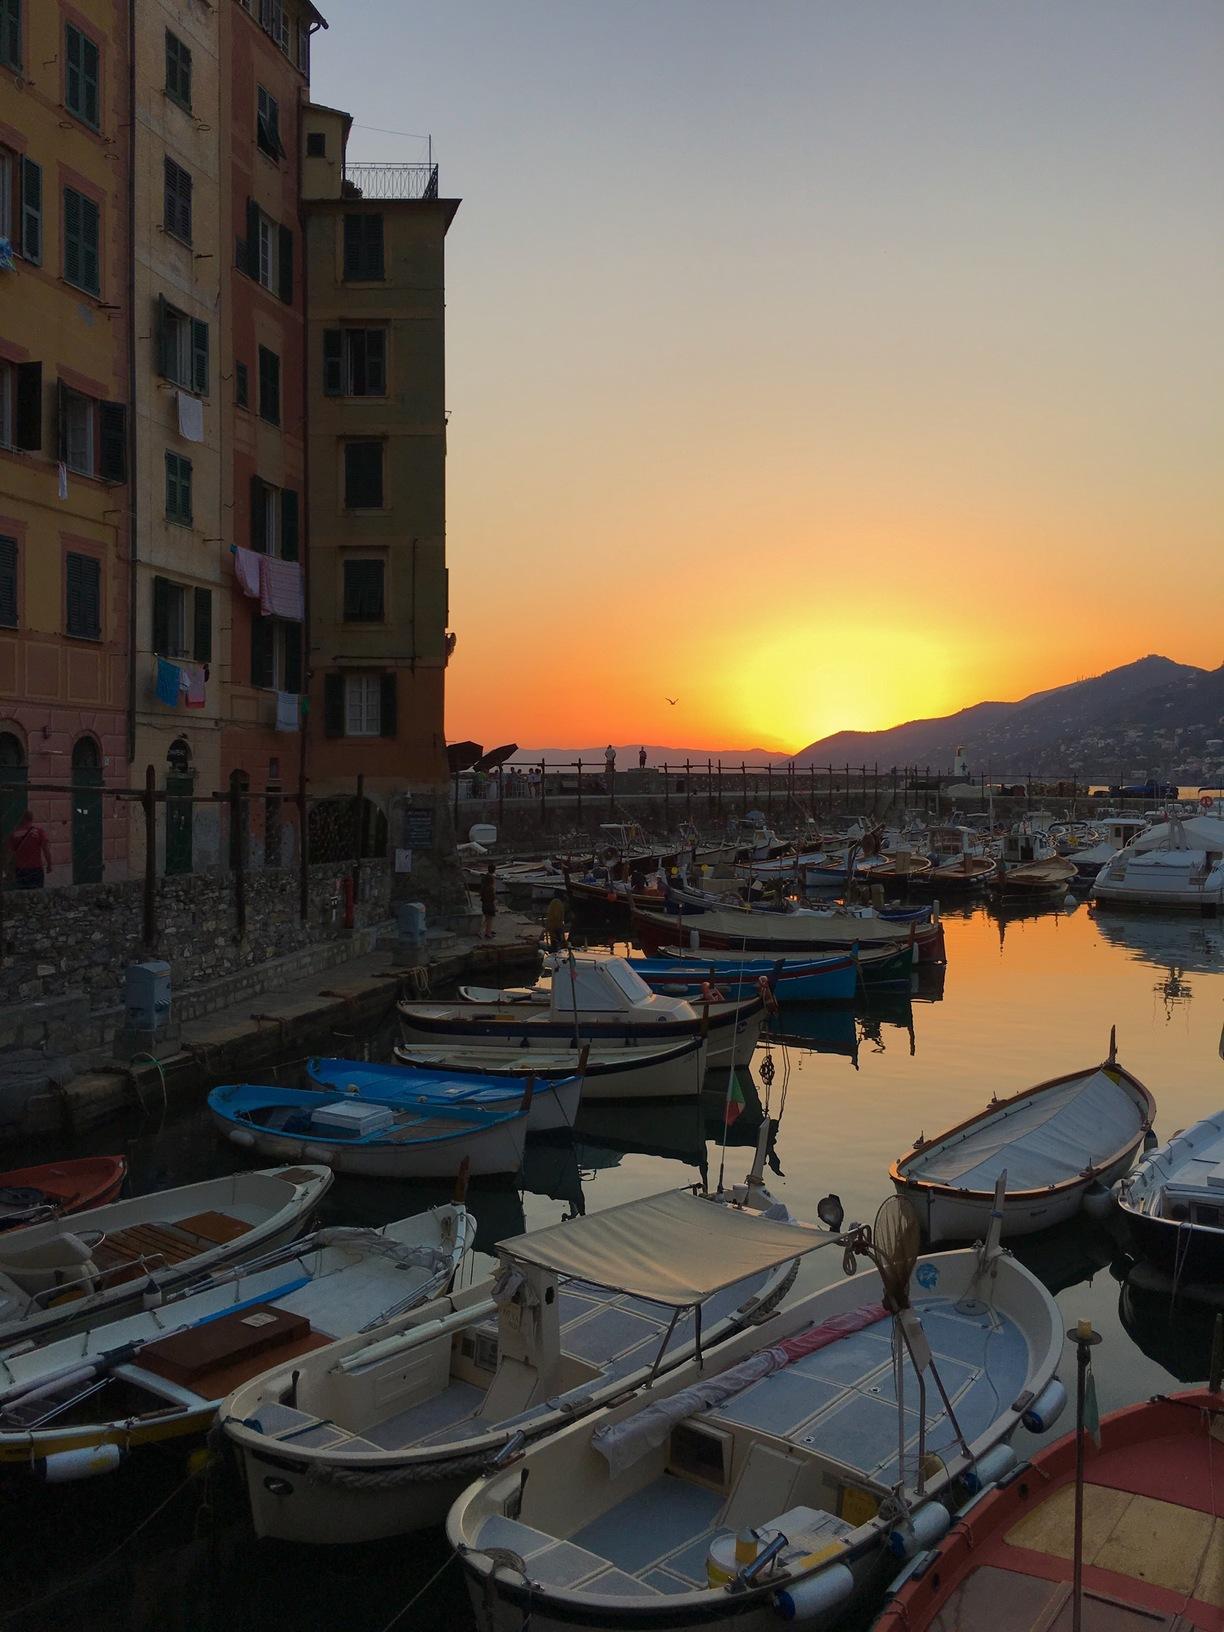 Camogli, Camogli, Italy - Sun goes down at the harbour of Camogli,...